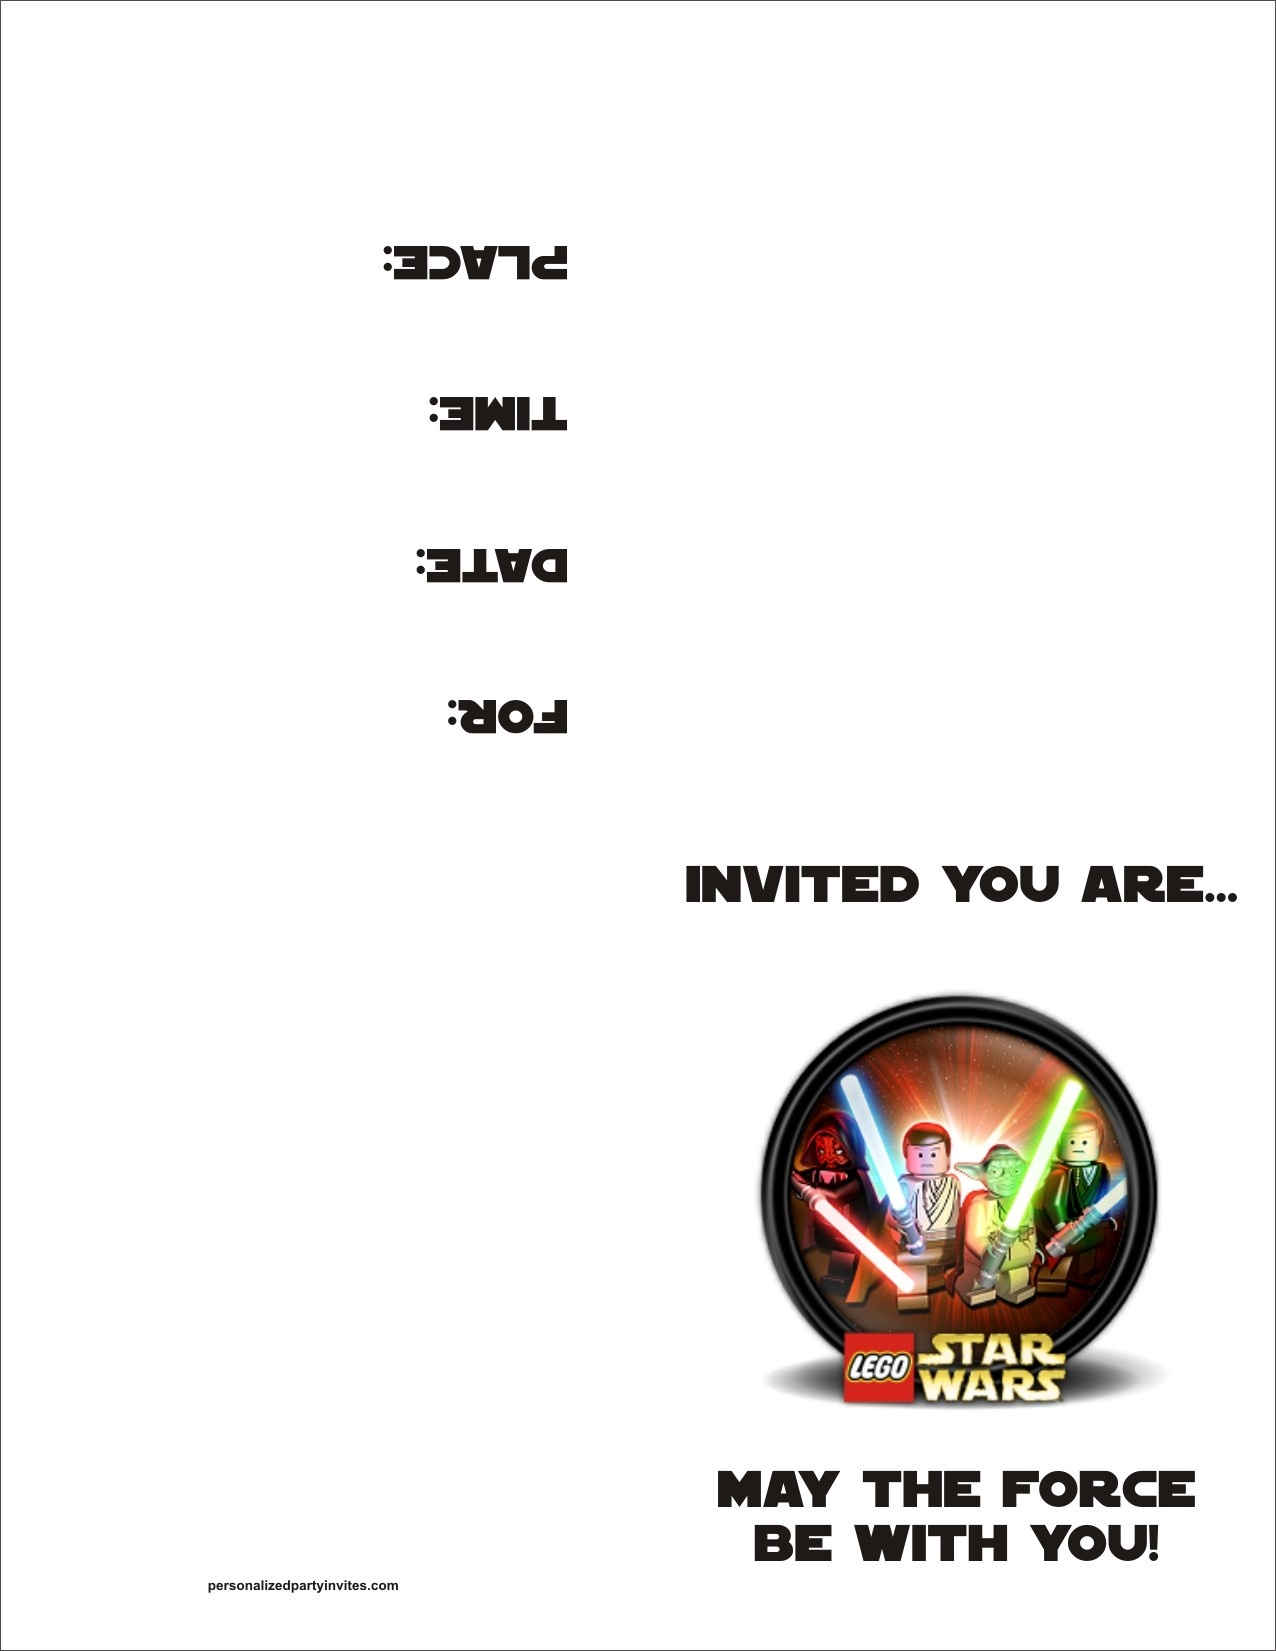 Lego Star Wars Free Printable Birthday Party Invitation Personalized - Star Wars Invitations Free Printable